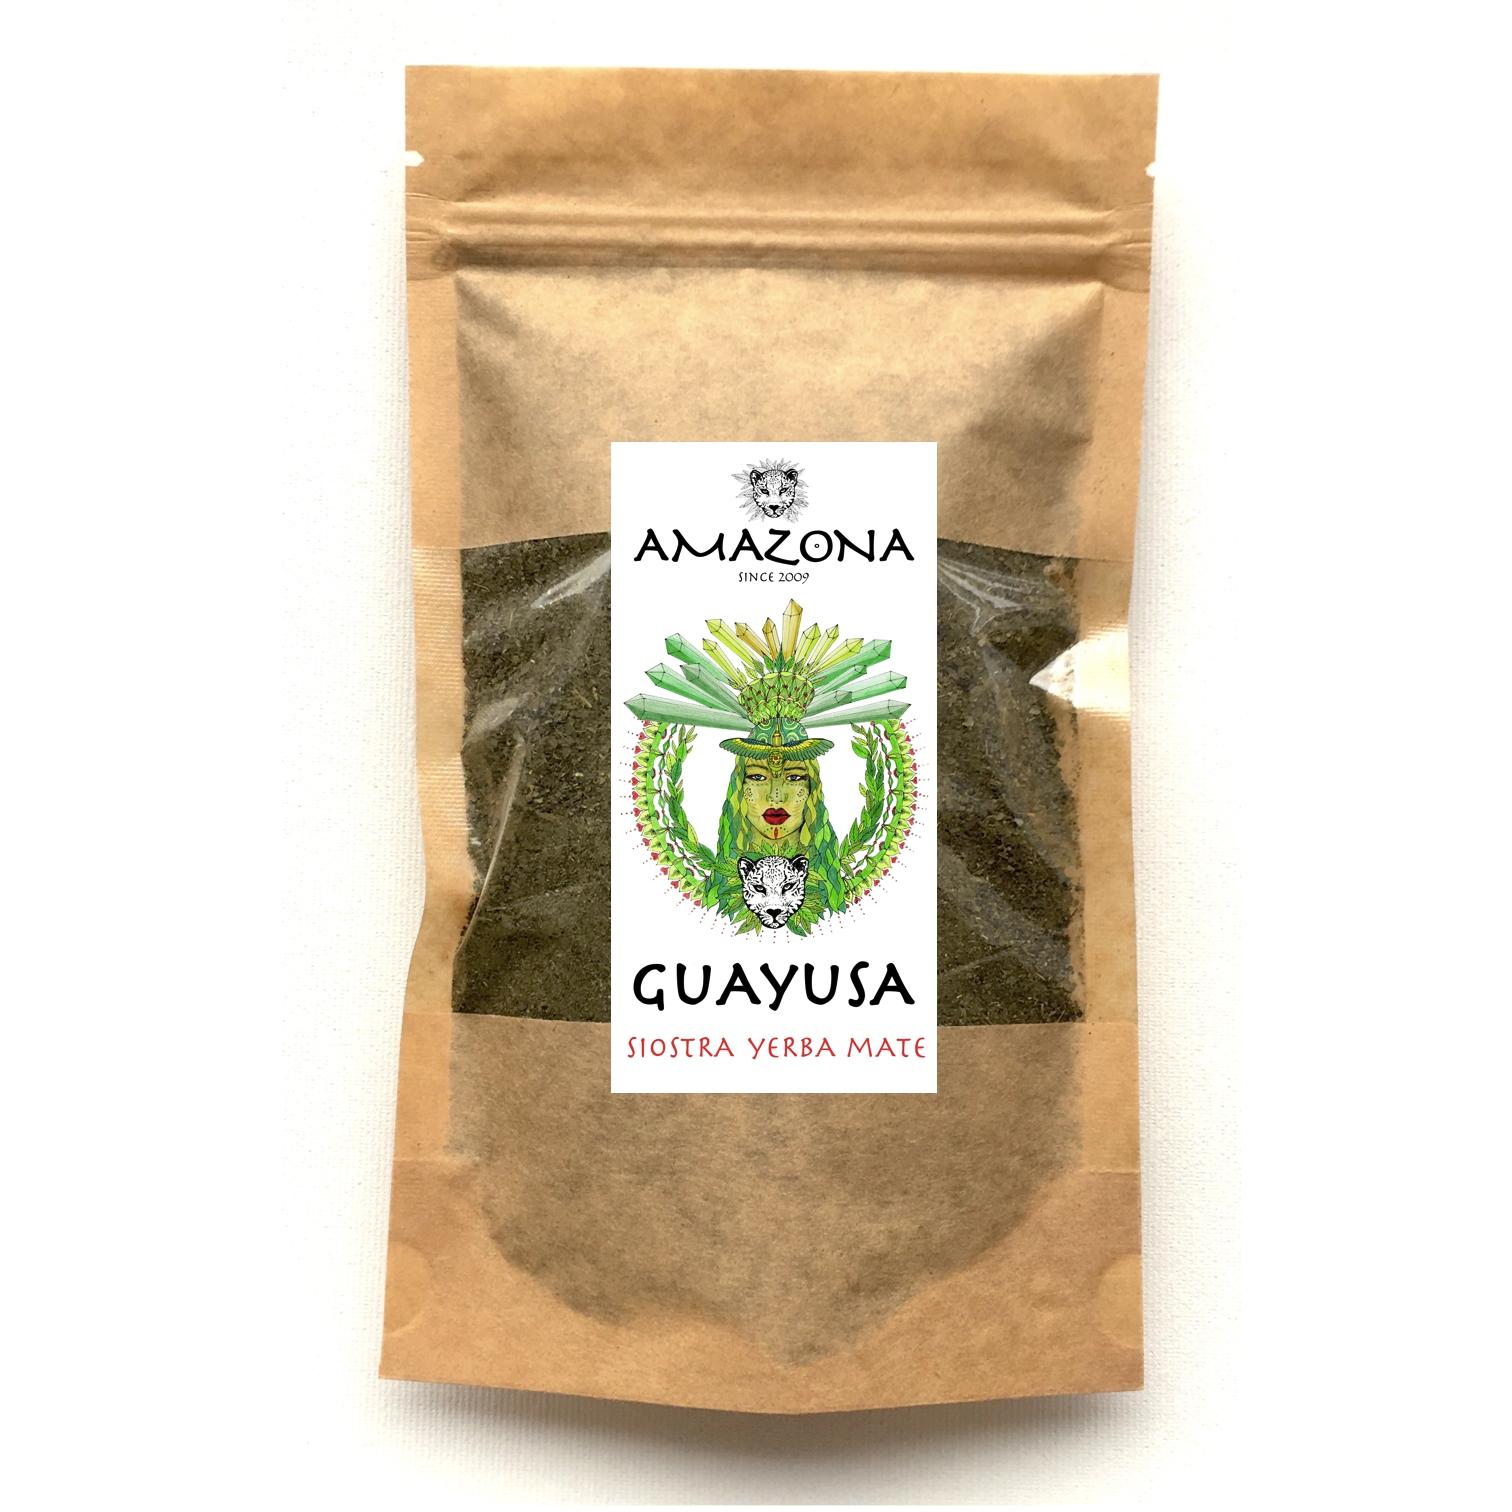 Guayusa 1000g Ilex Guayusa